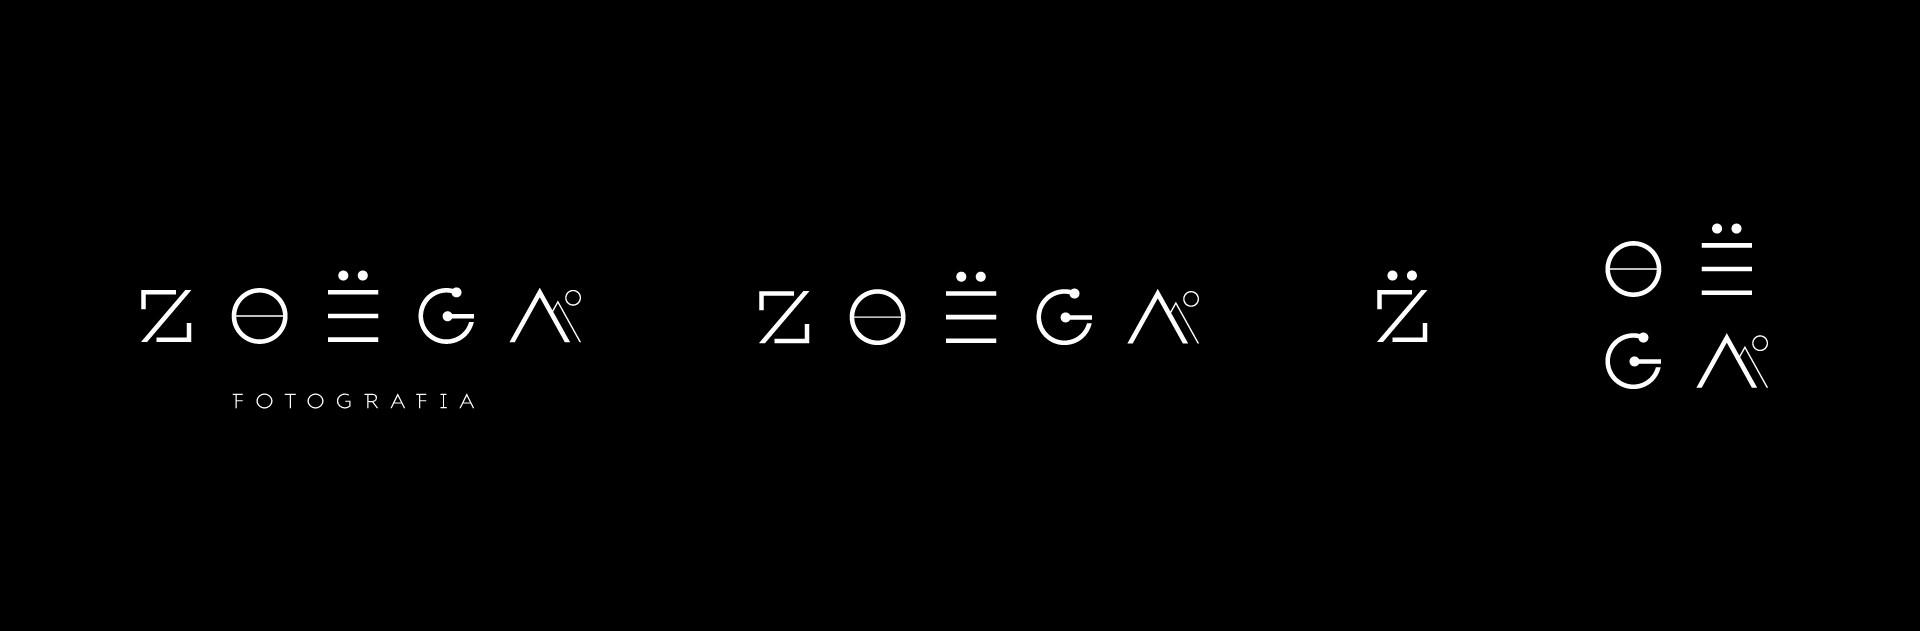 img-portfolio-zoega-voadora (2).jpg